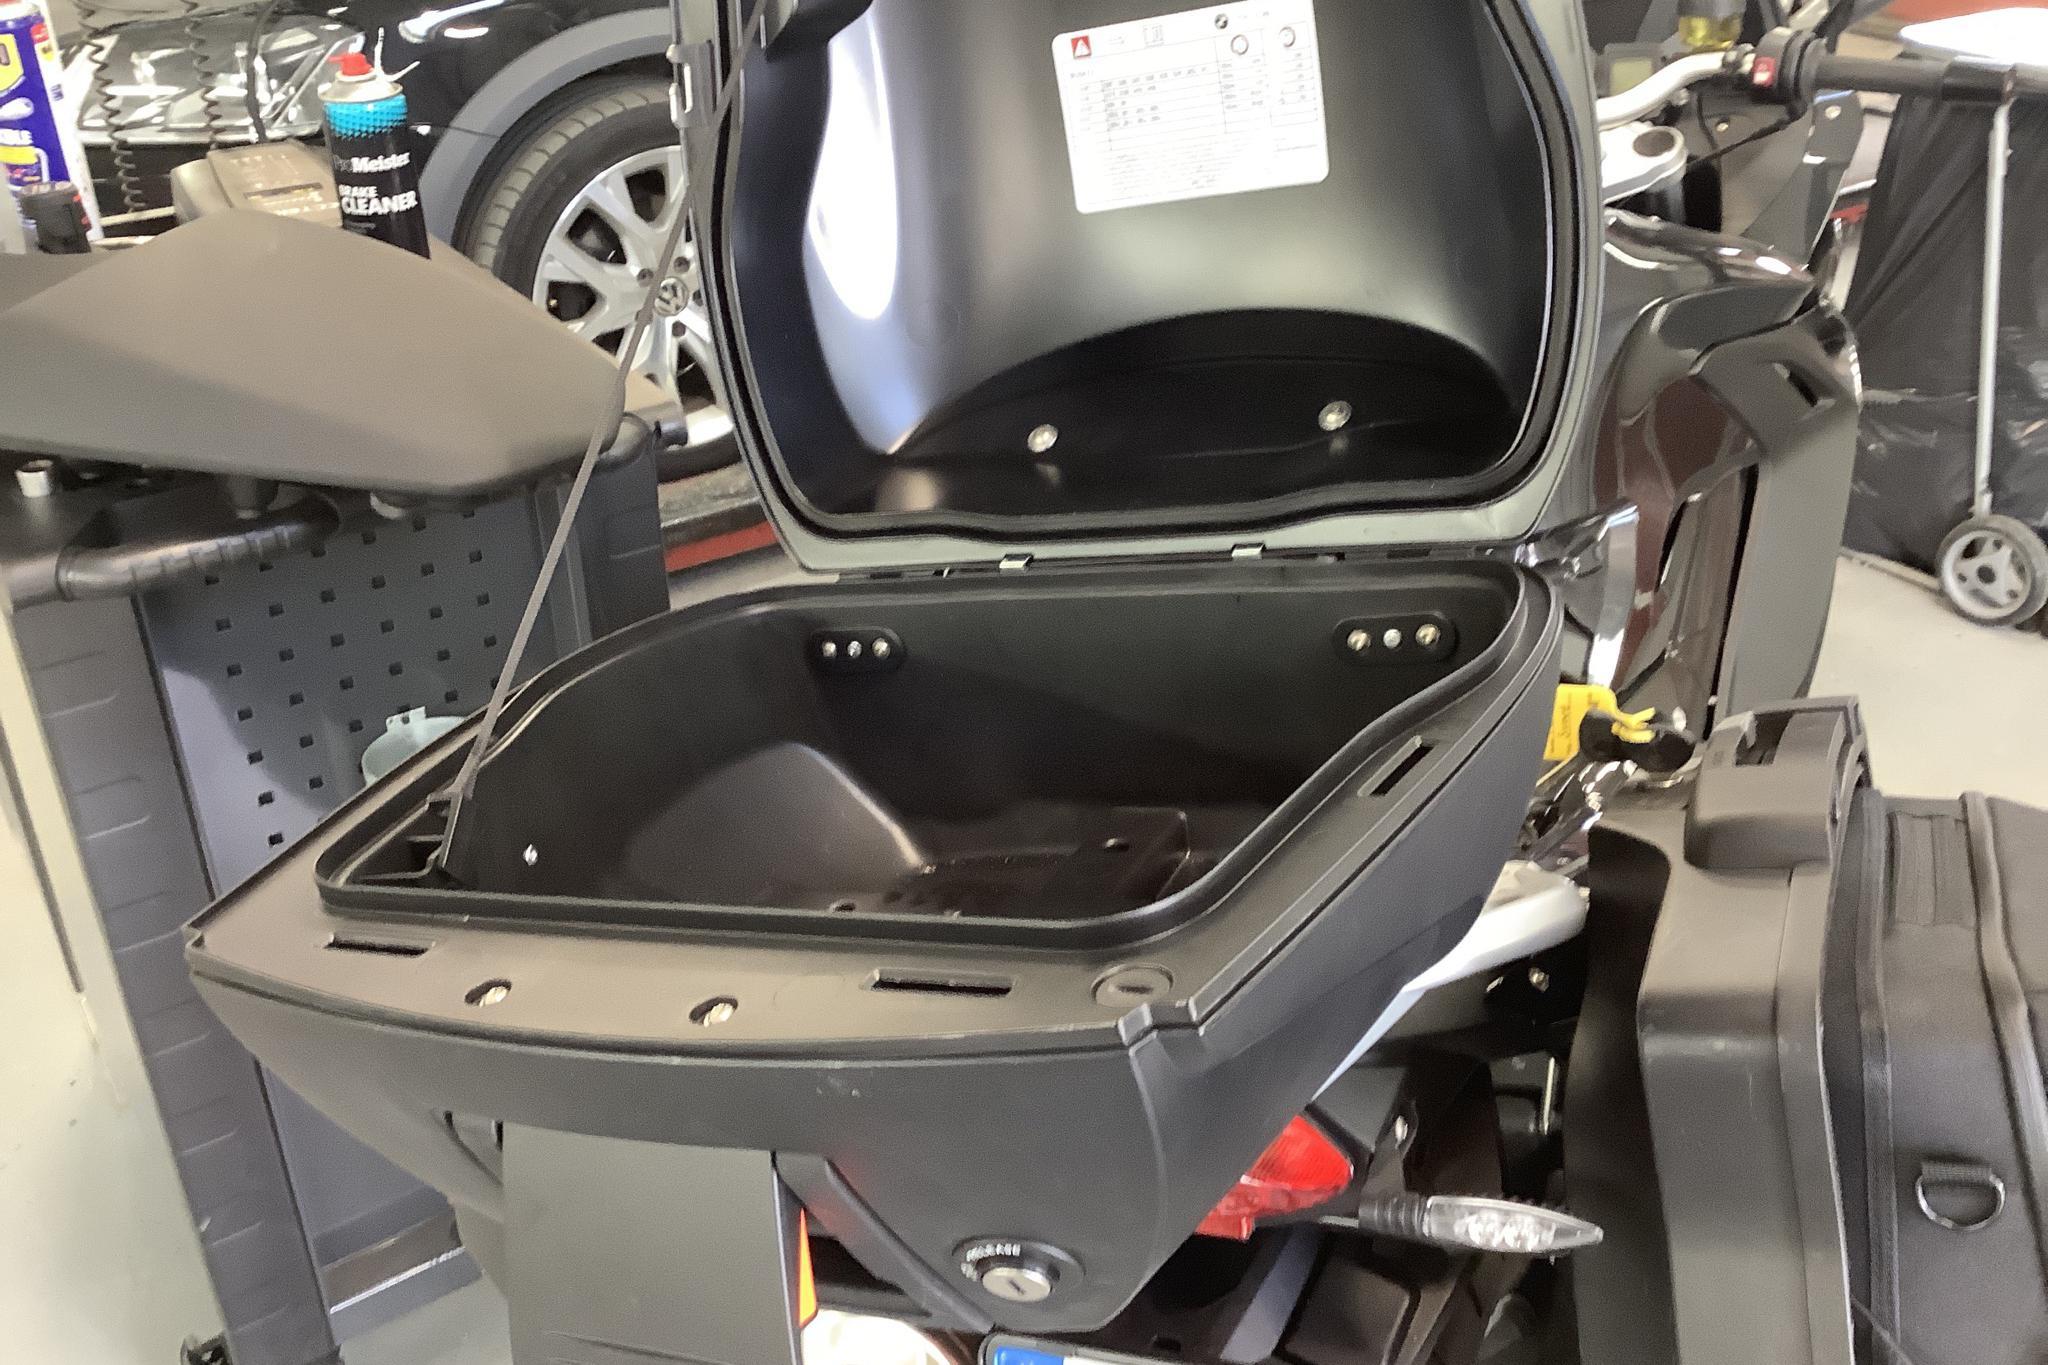 BMW F 800 GT Motorcykel - 6 500 km - Manual - Dark Grey - 2014